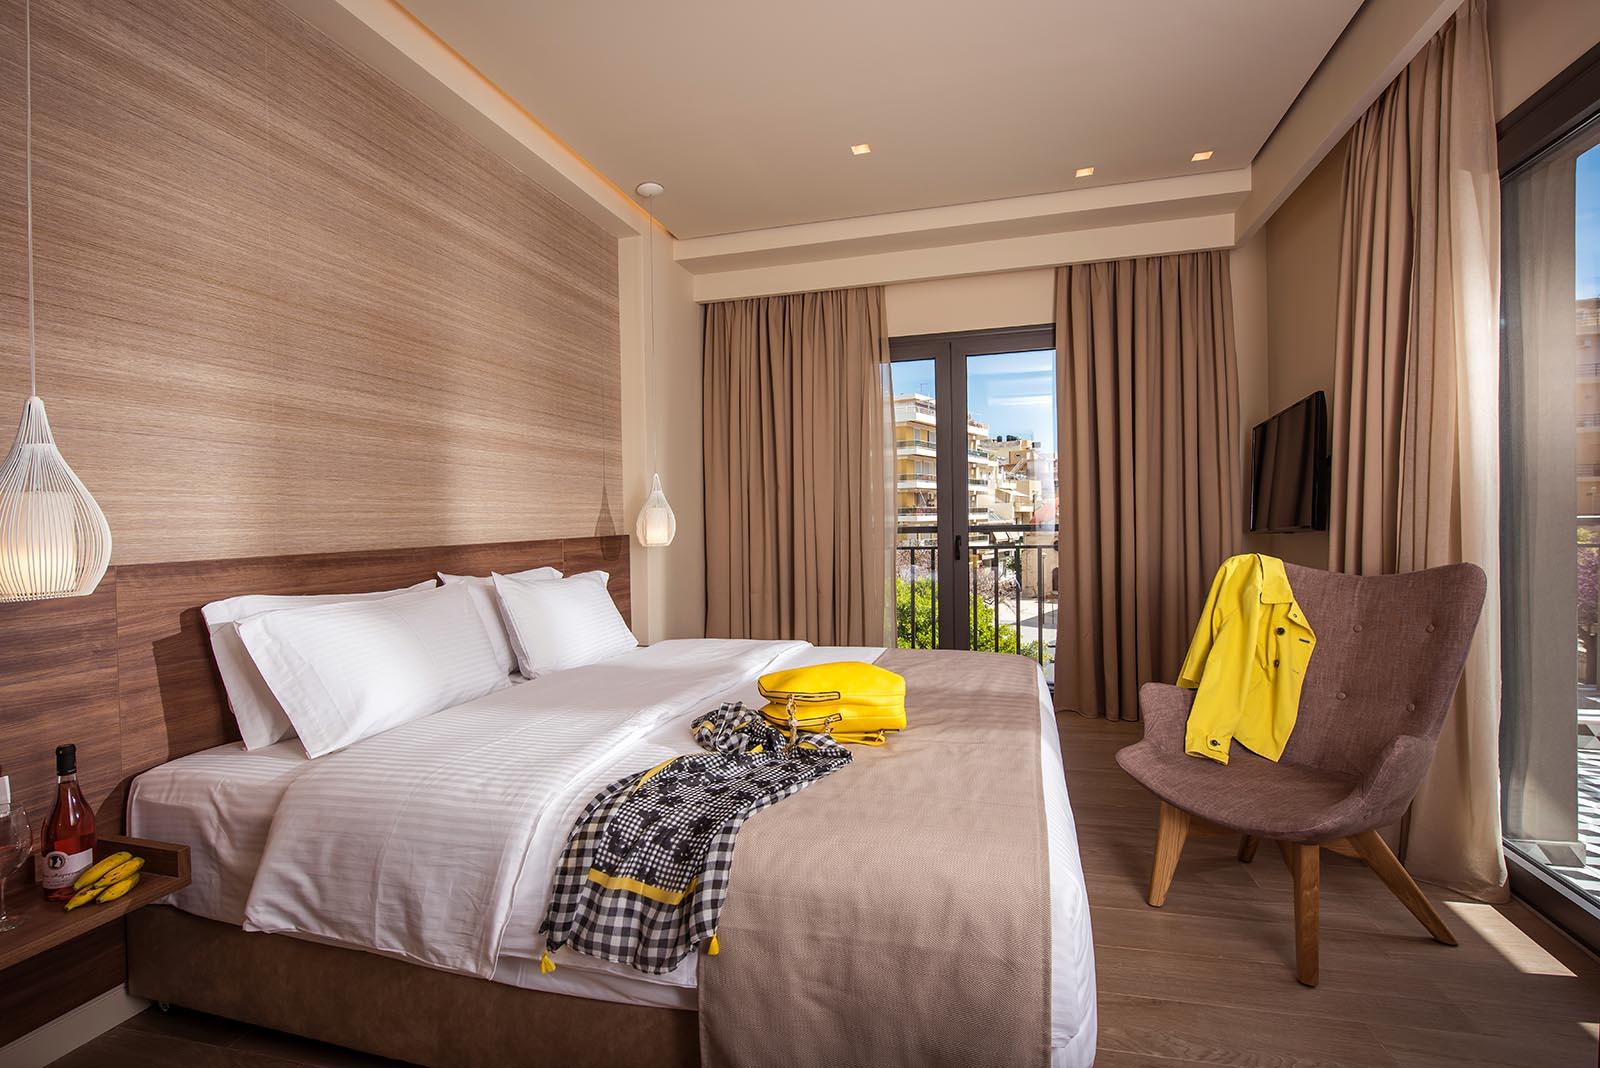 heraklion hotel Crete - Metropole Urban Hotel